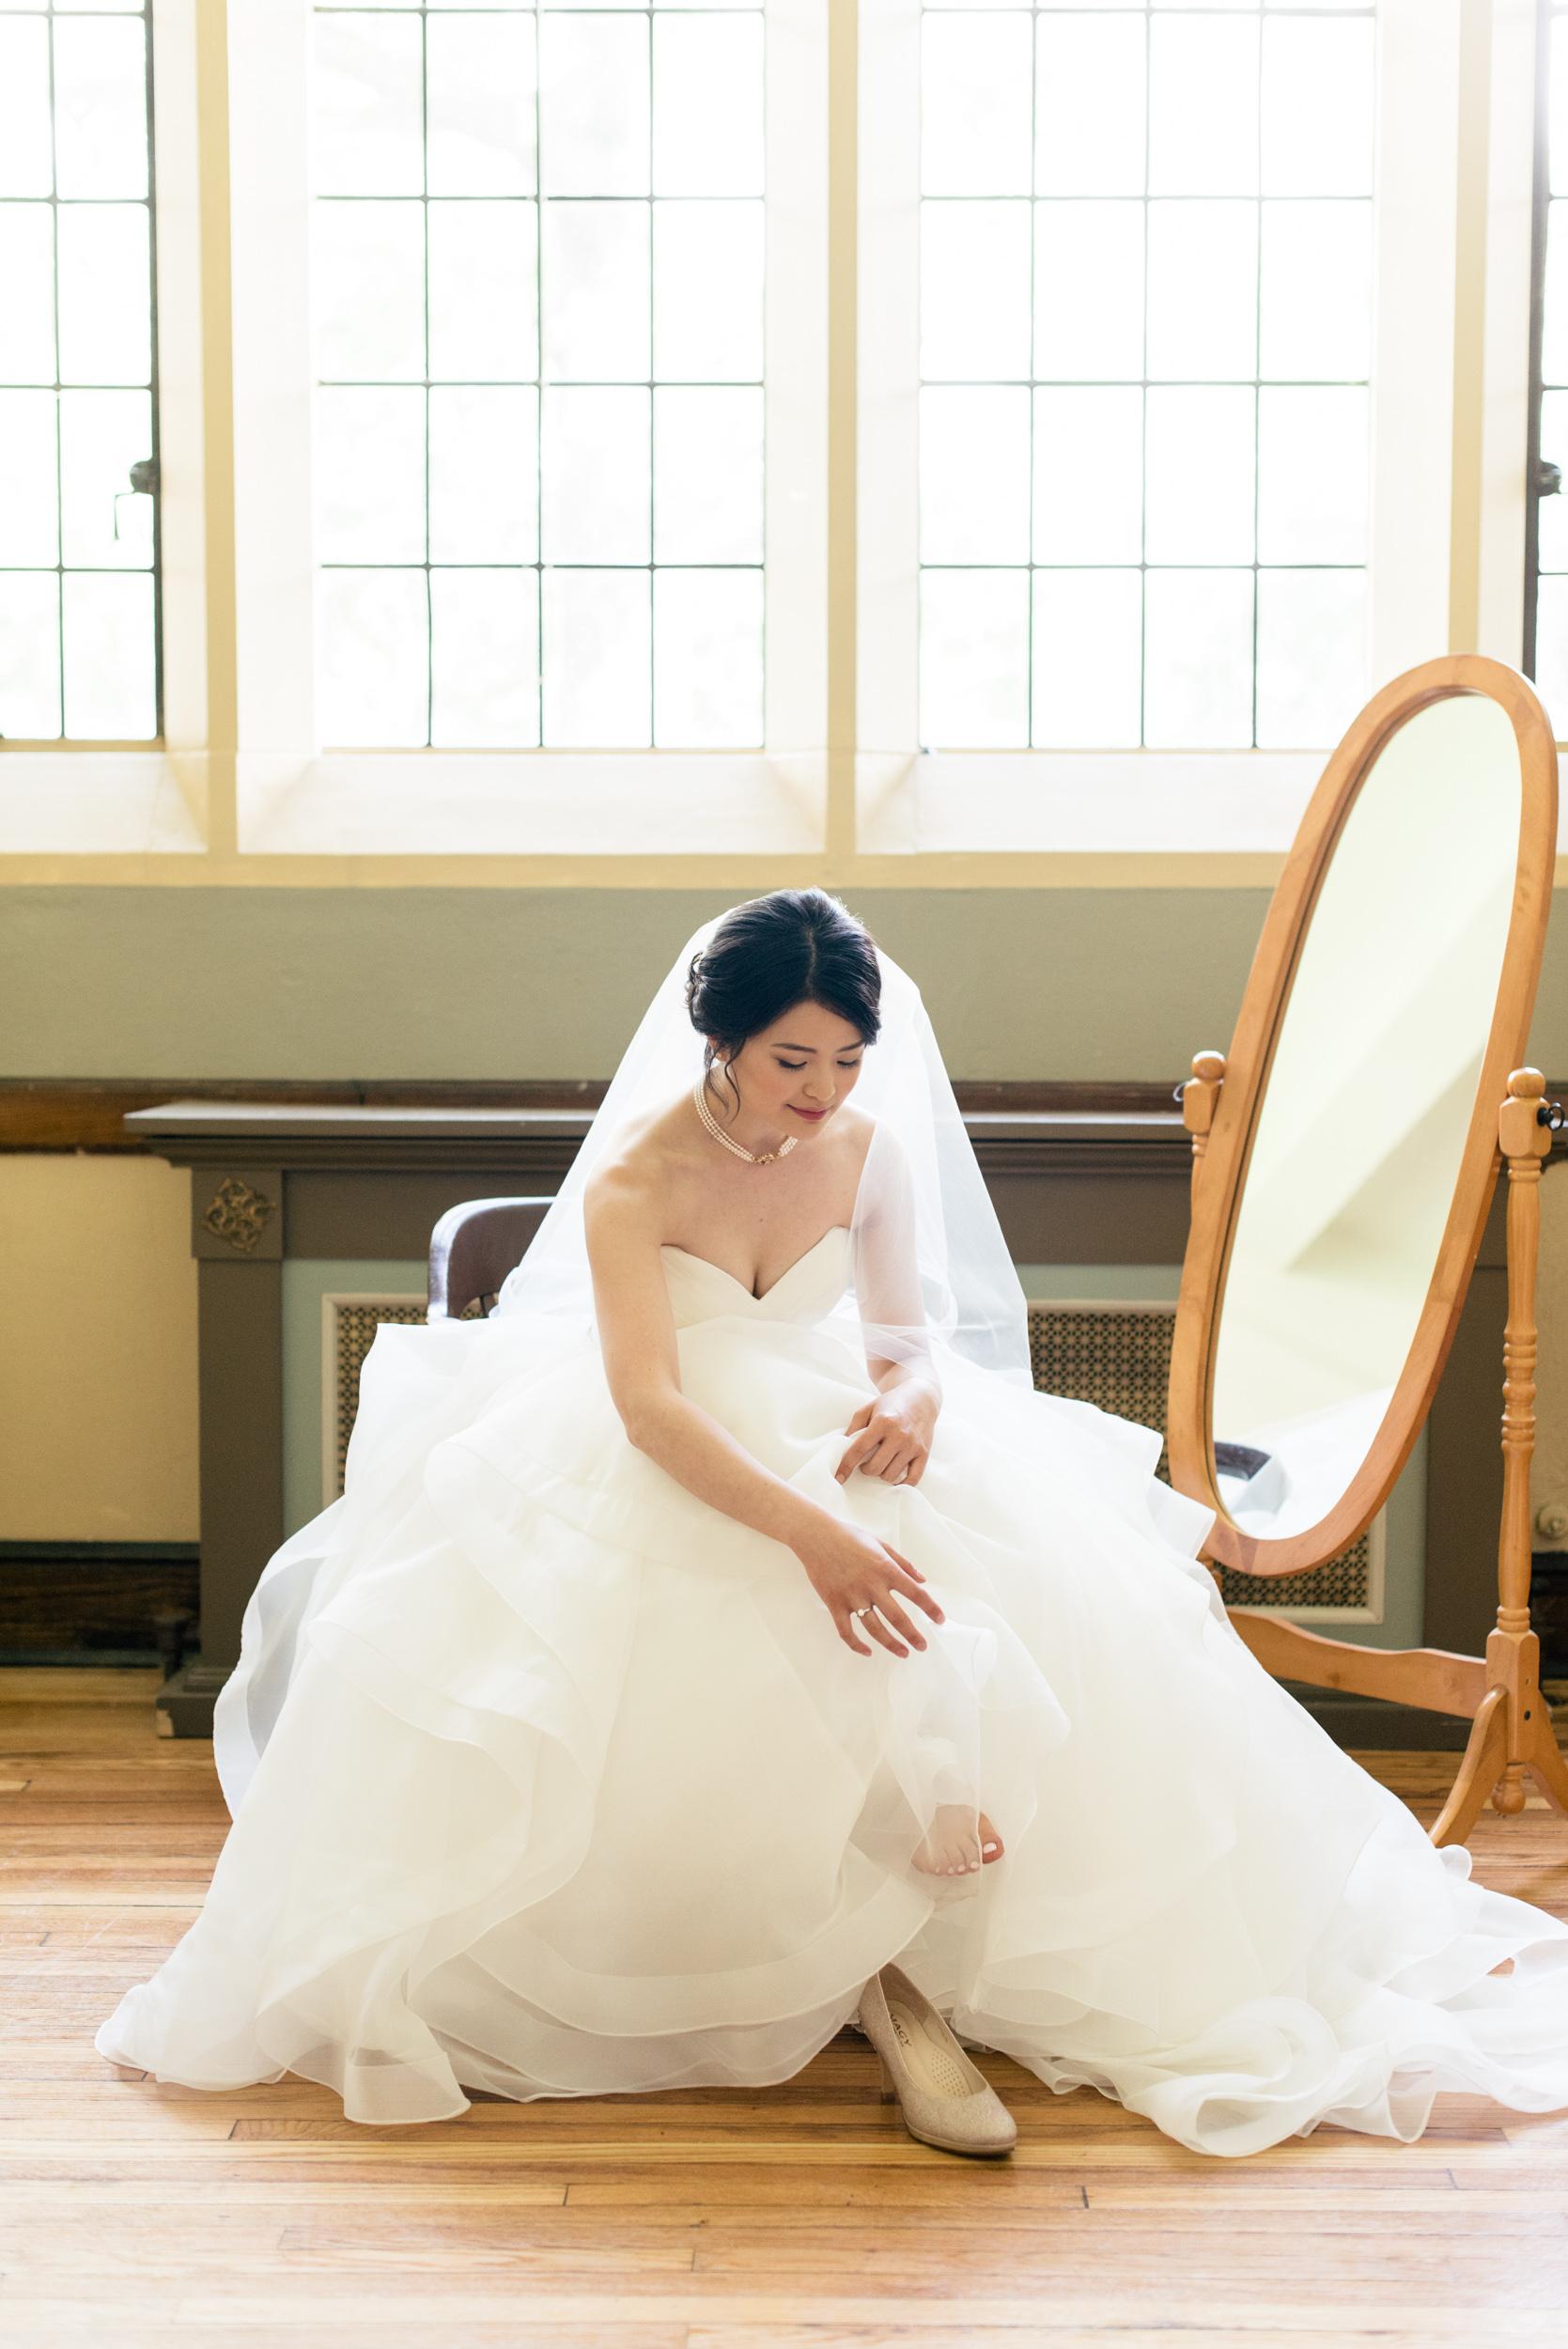 knox-college-wedding-106.jpg